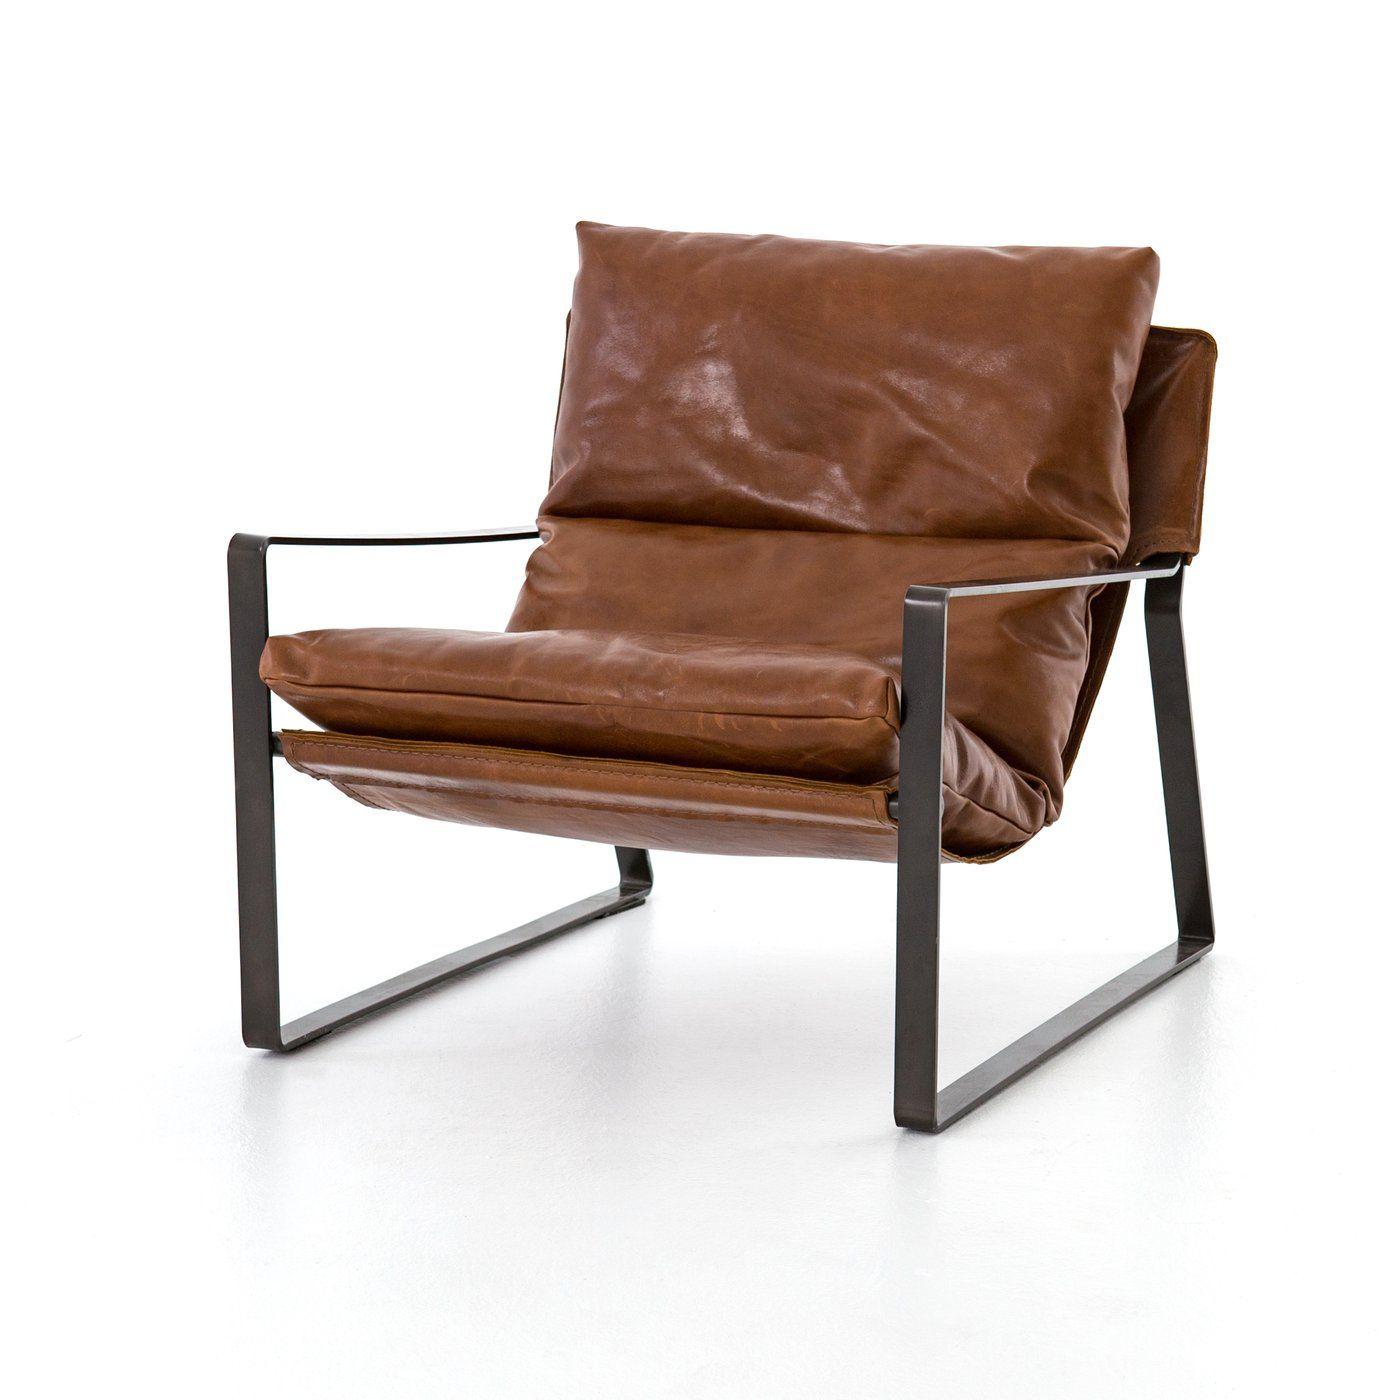 Emmett Sling Chair Dakota Tobacco In 2019 New Place